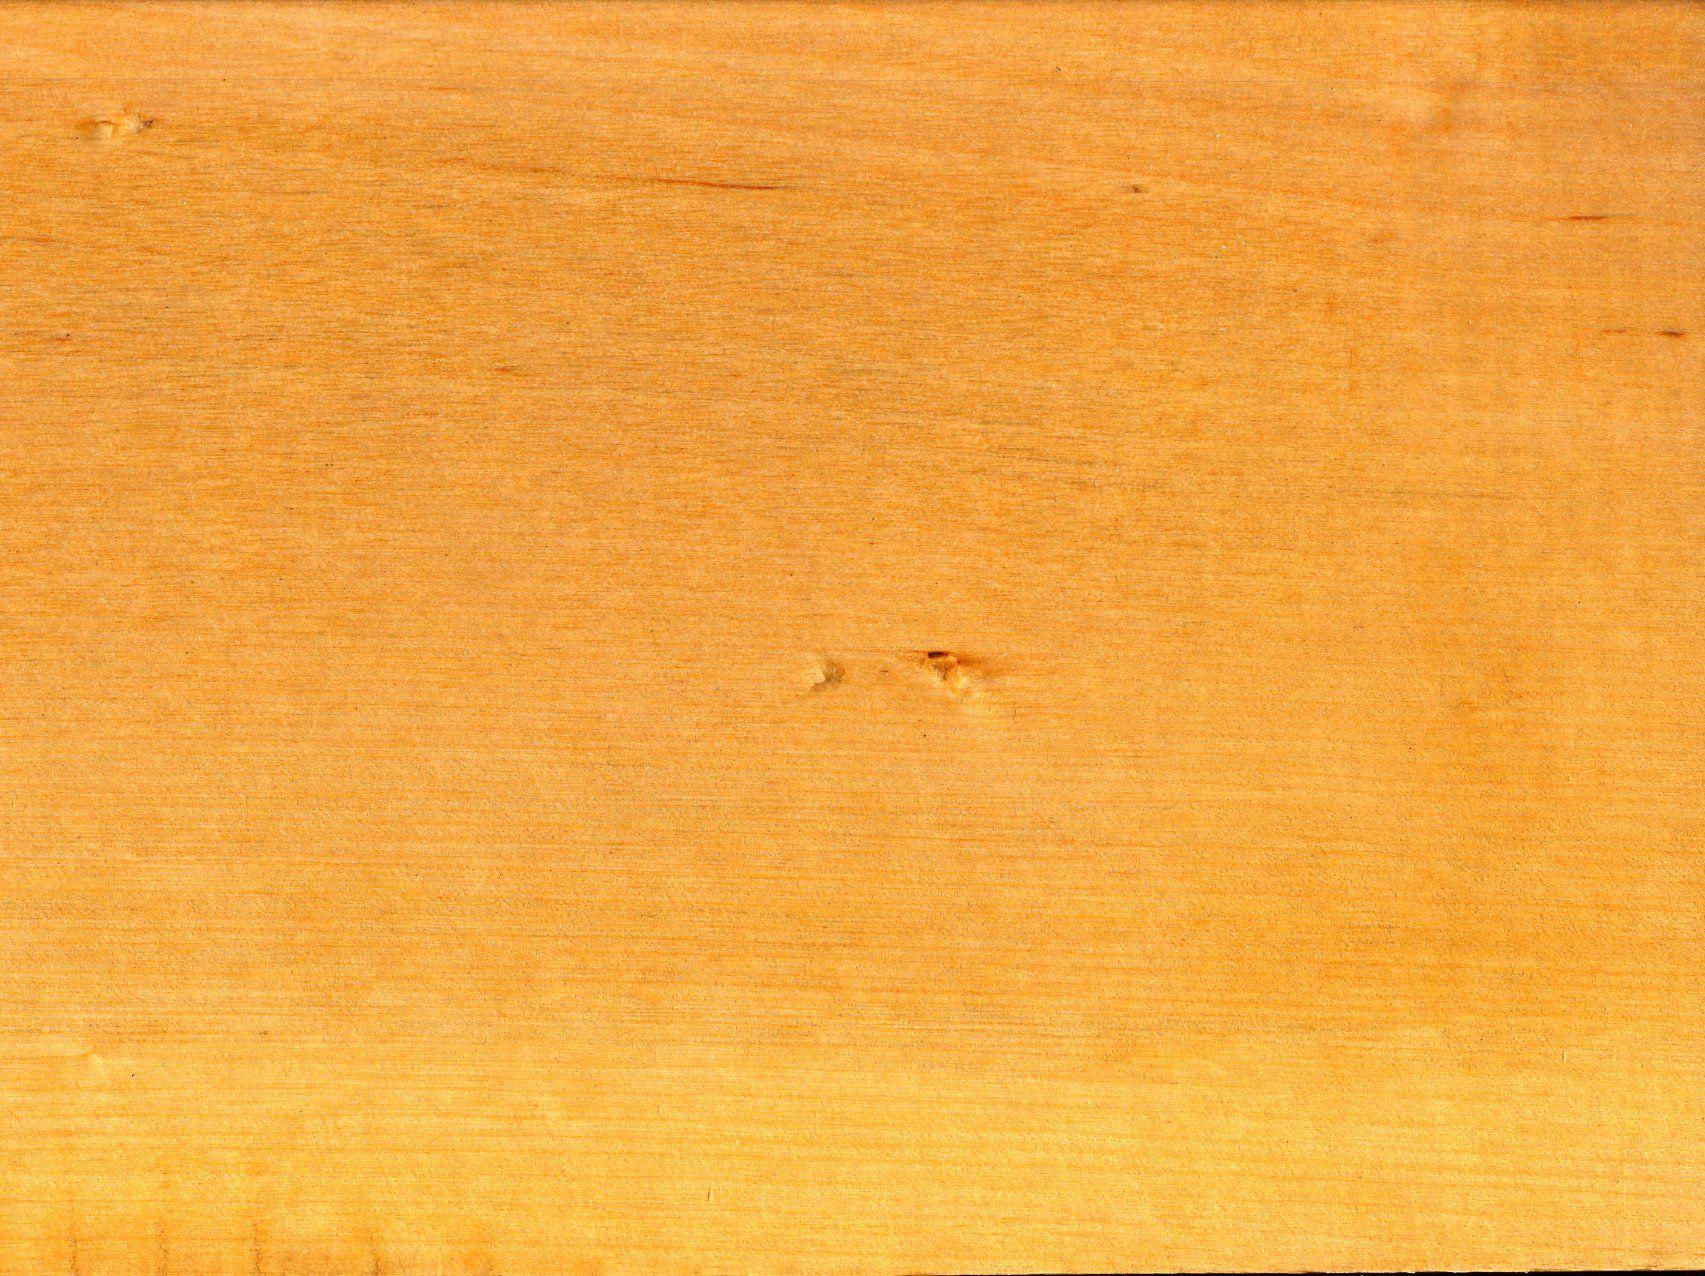 Цвет древесины берёзы